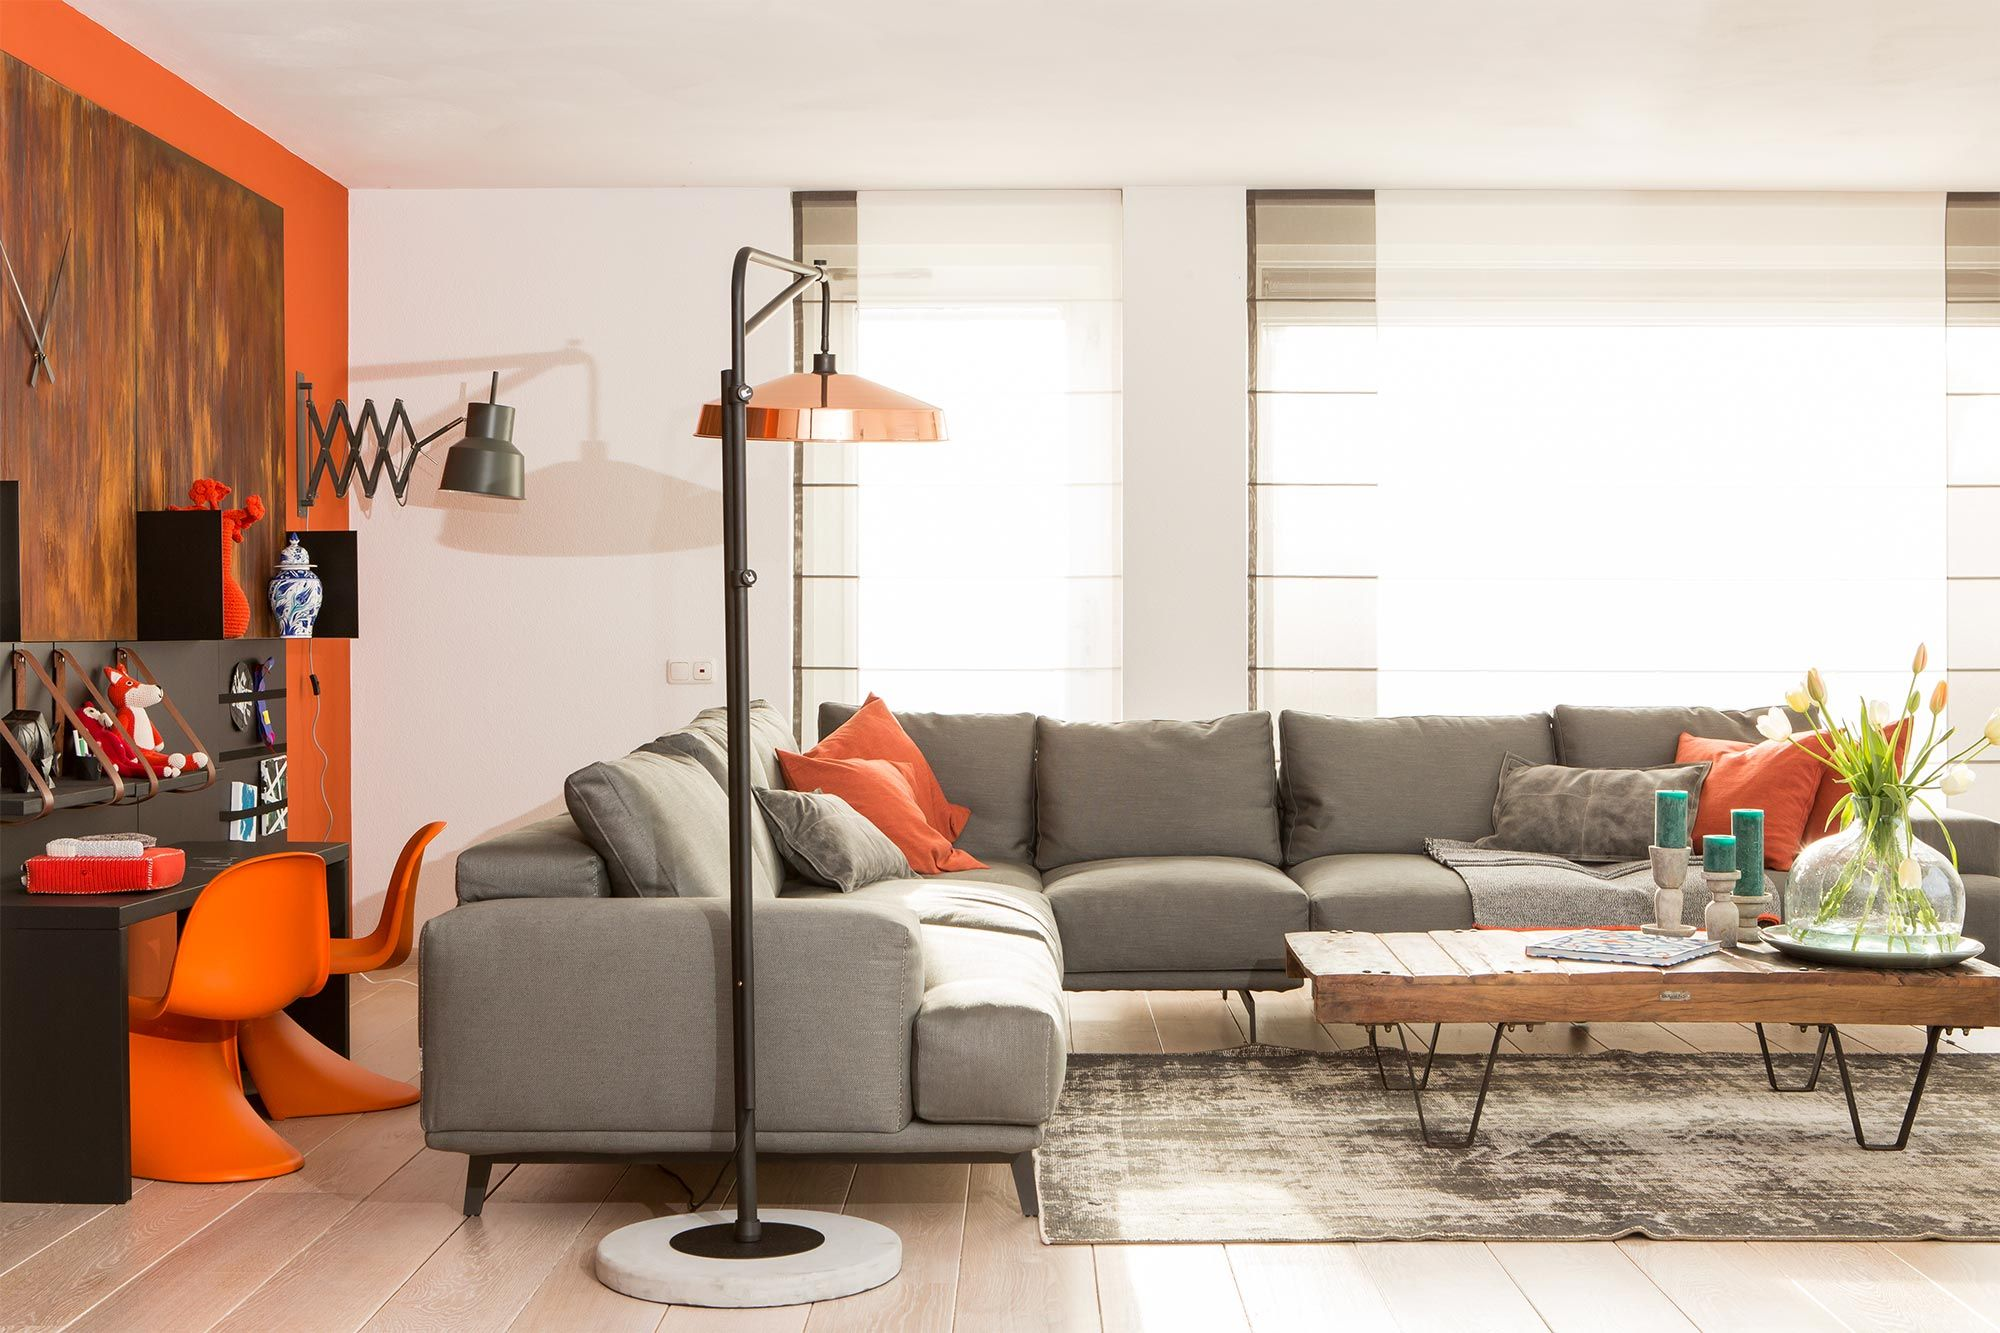 Oranje woonkamer bij Muserref en Battal uit aflevering 2